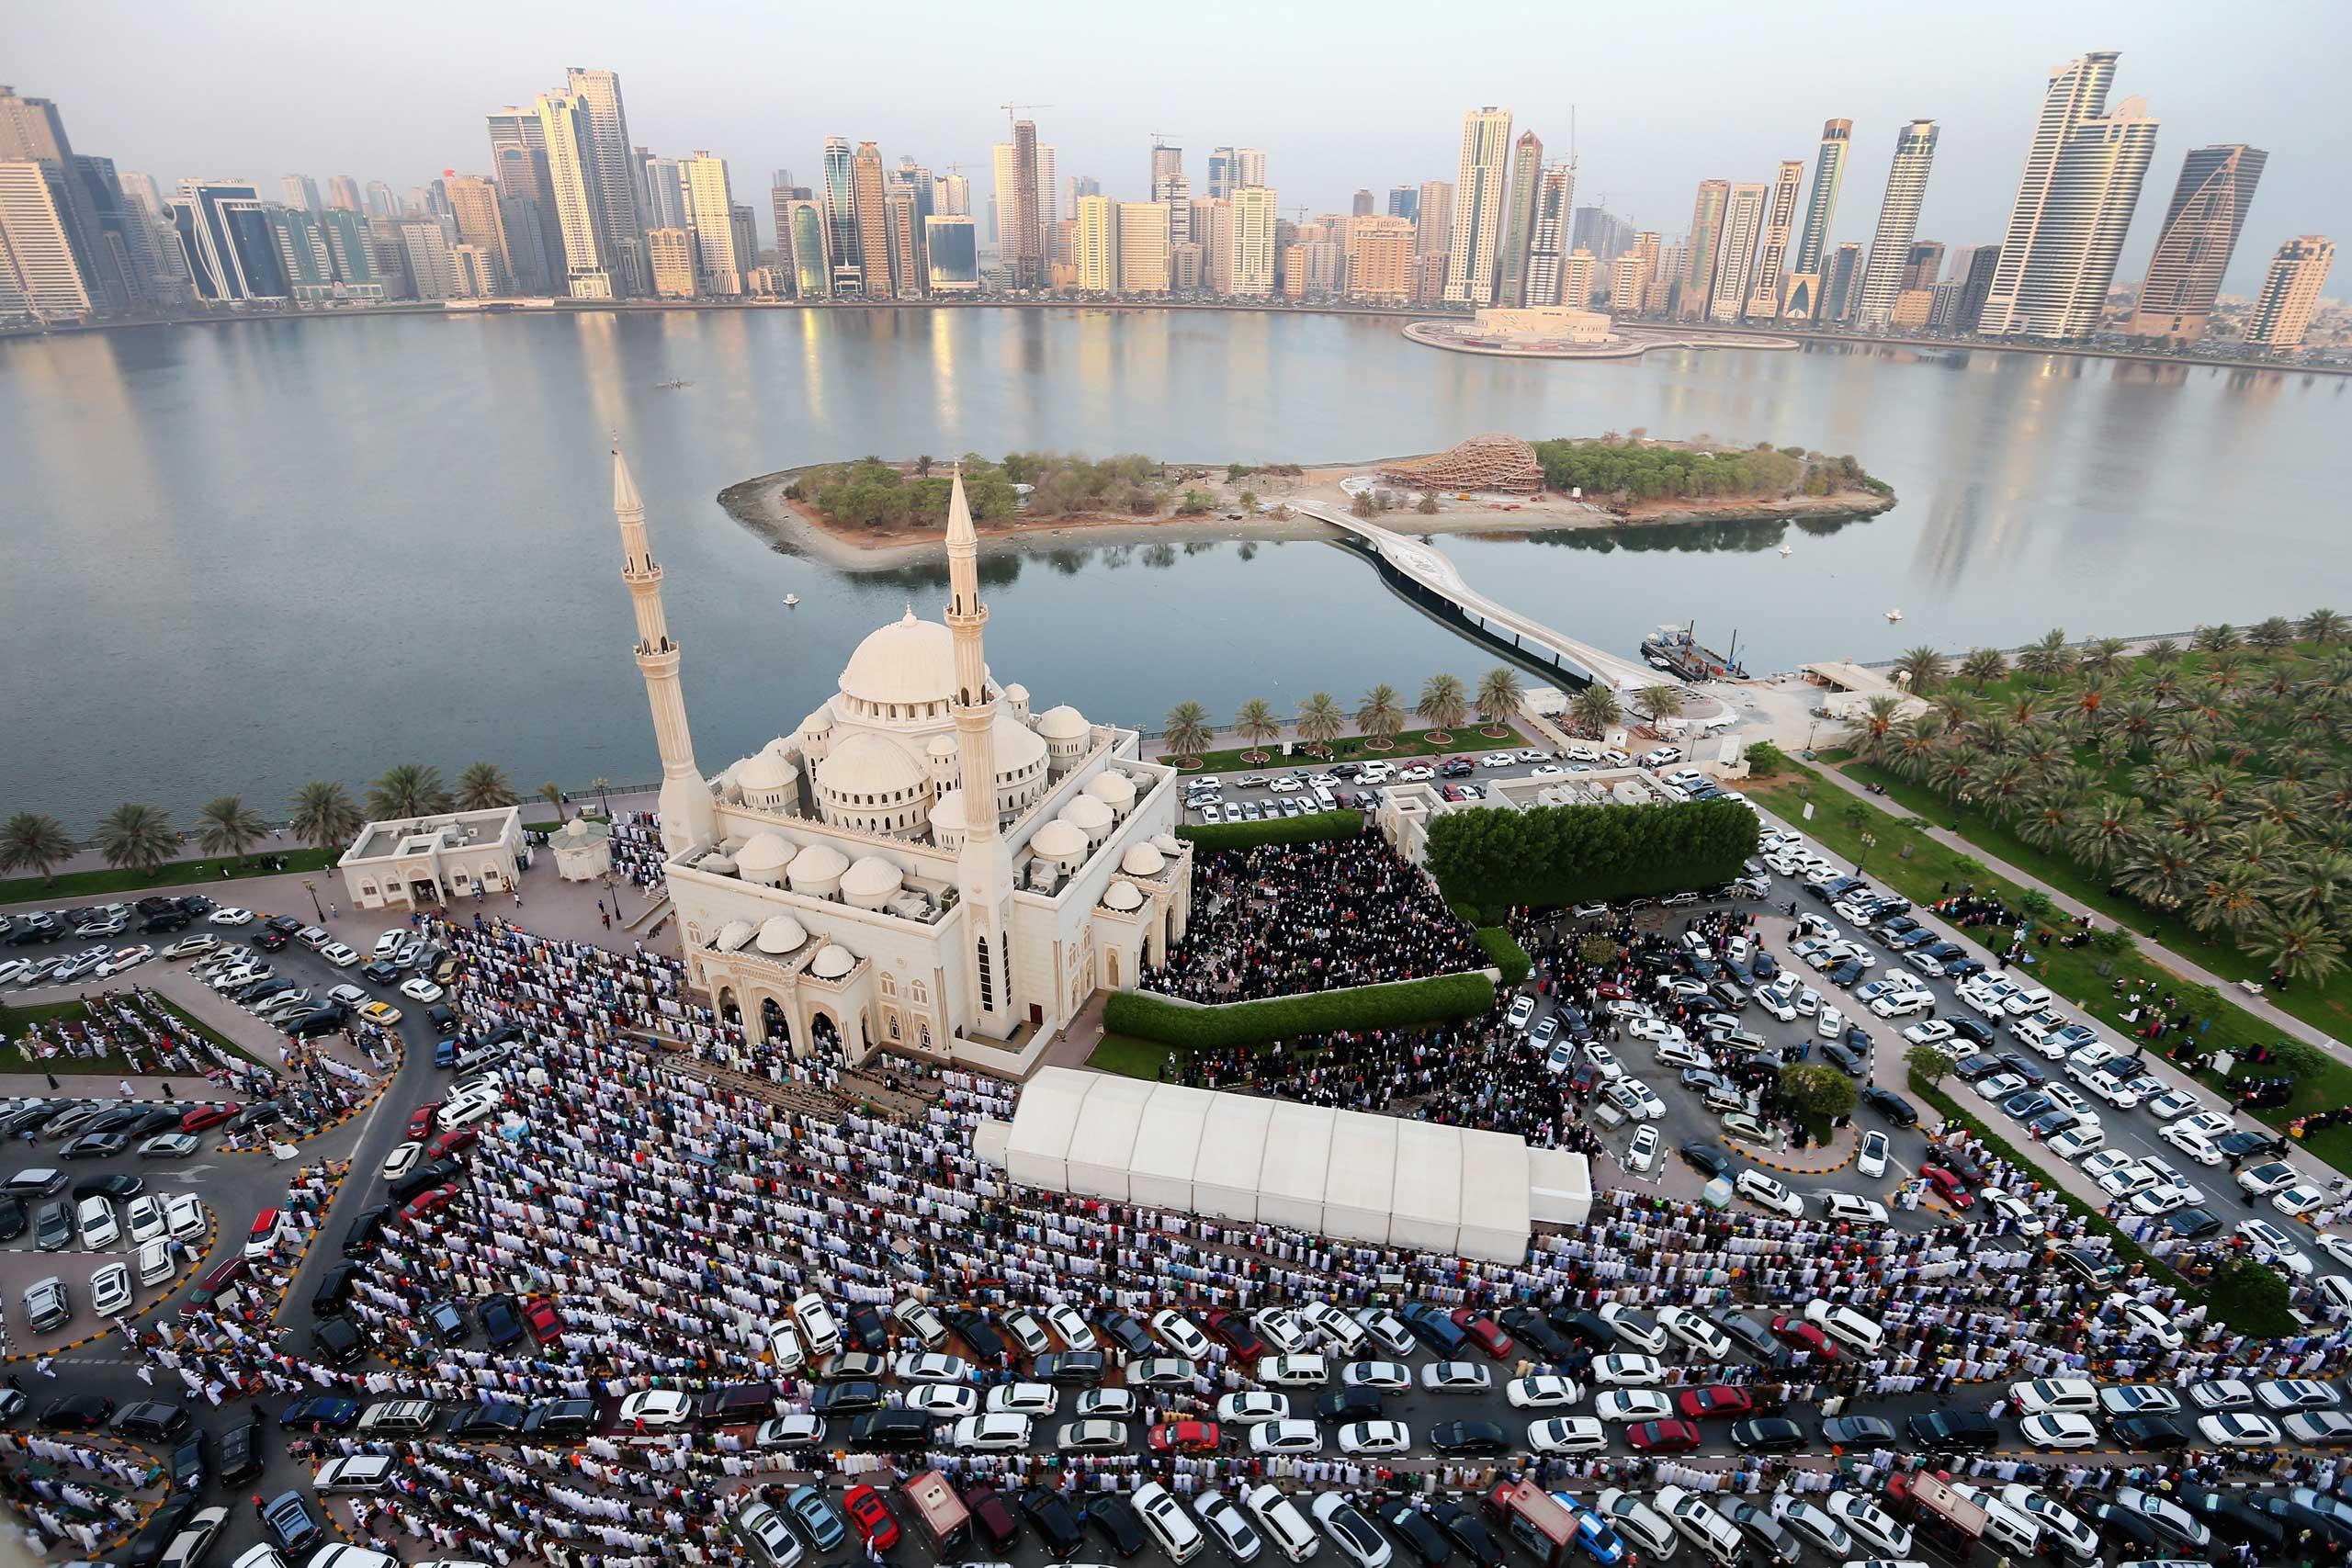 Muslims offer Eid al-Fitr prayers outside Al Noor Mosque in Sharjah, United Arab Emirates, on July 17, 2015.